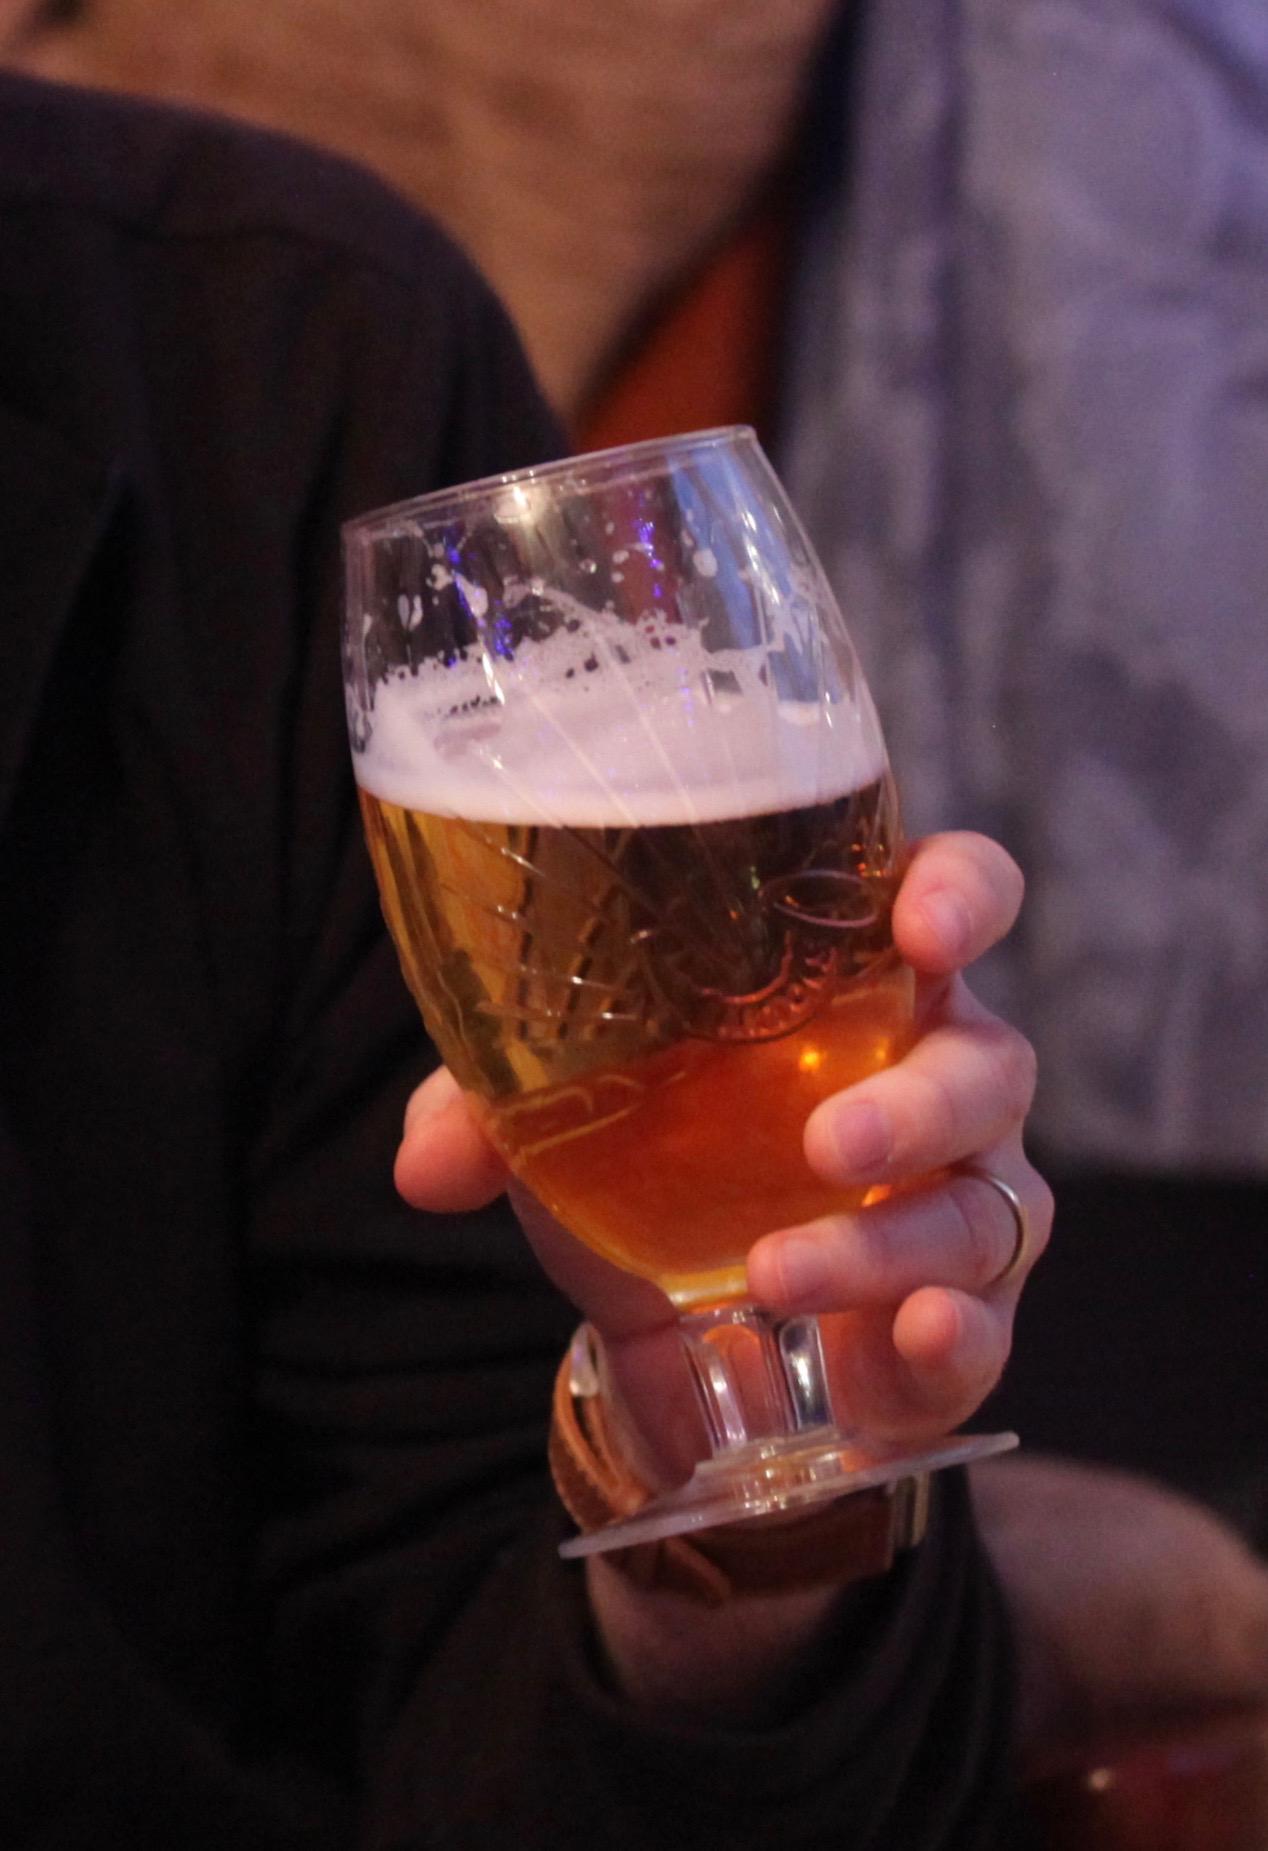 Beer glass 1